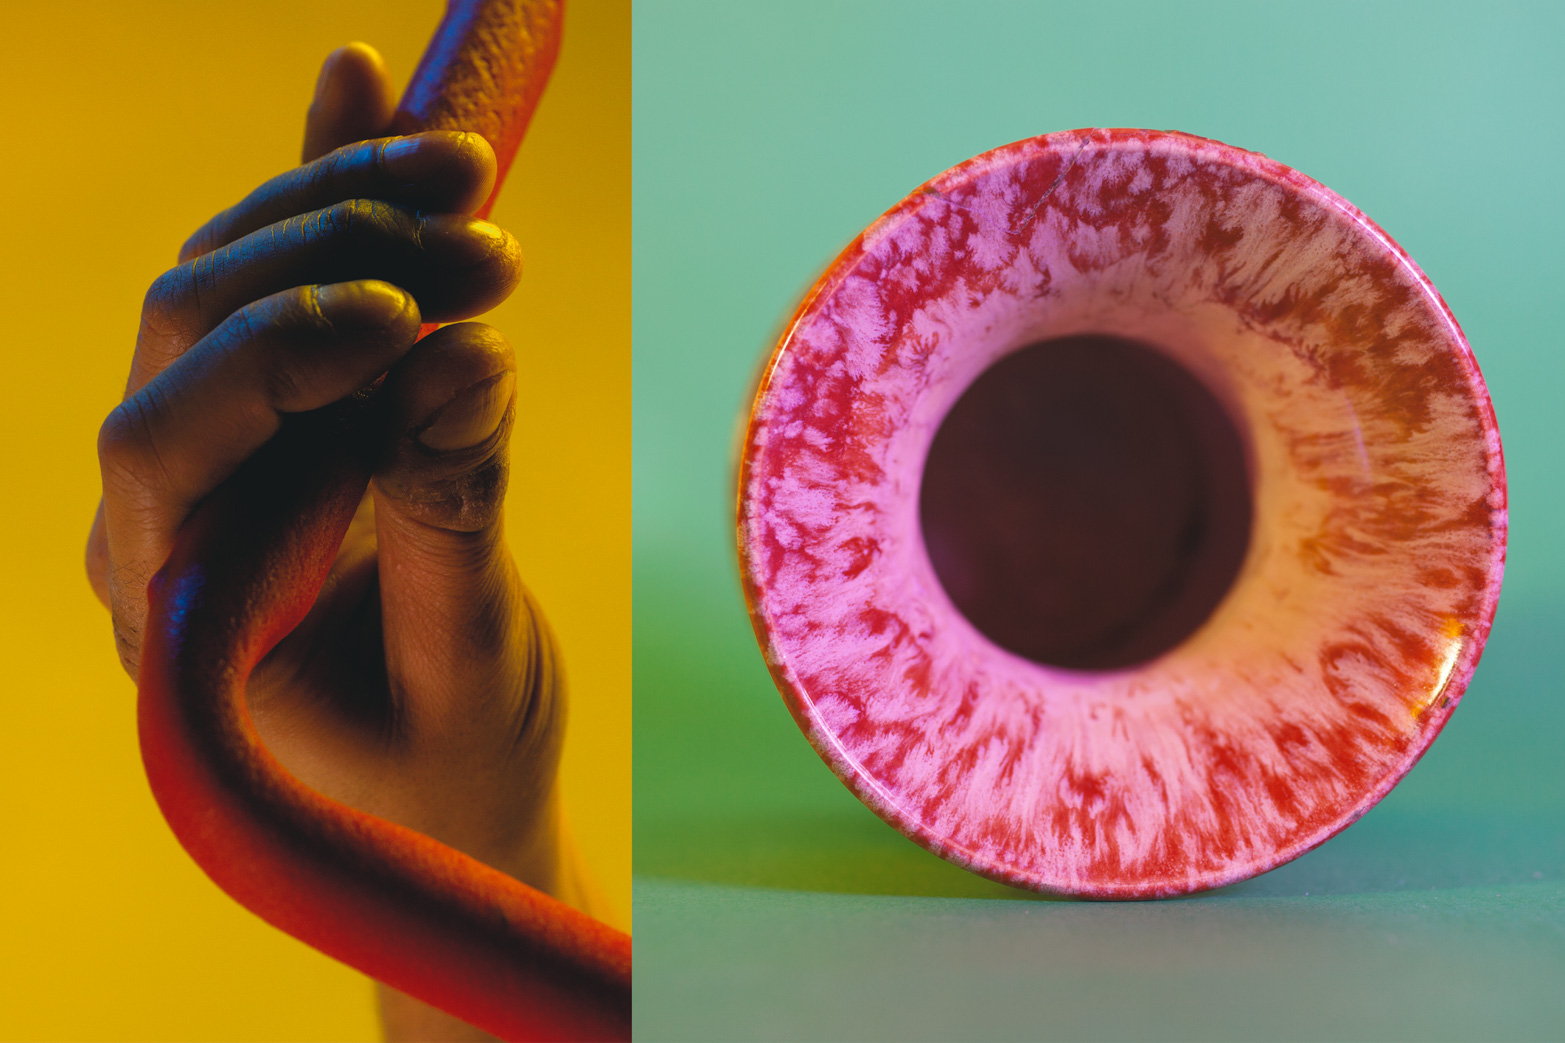 Ilona Sagar, Constant Object II, 2015.